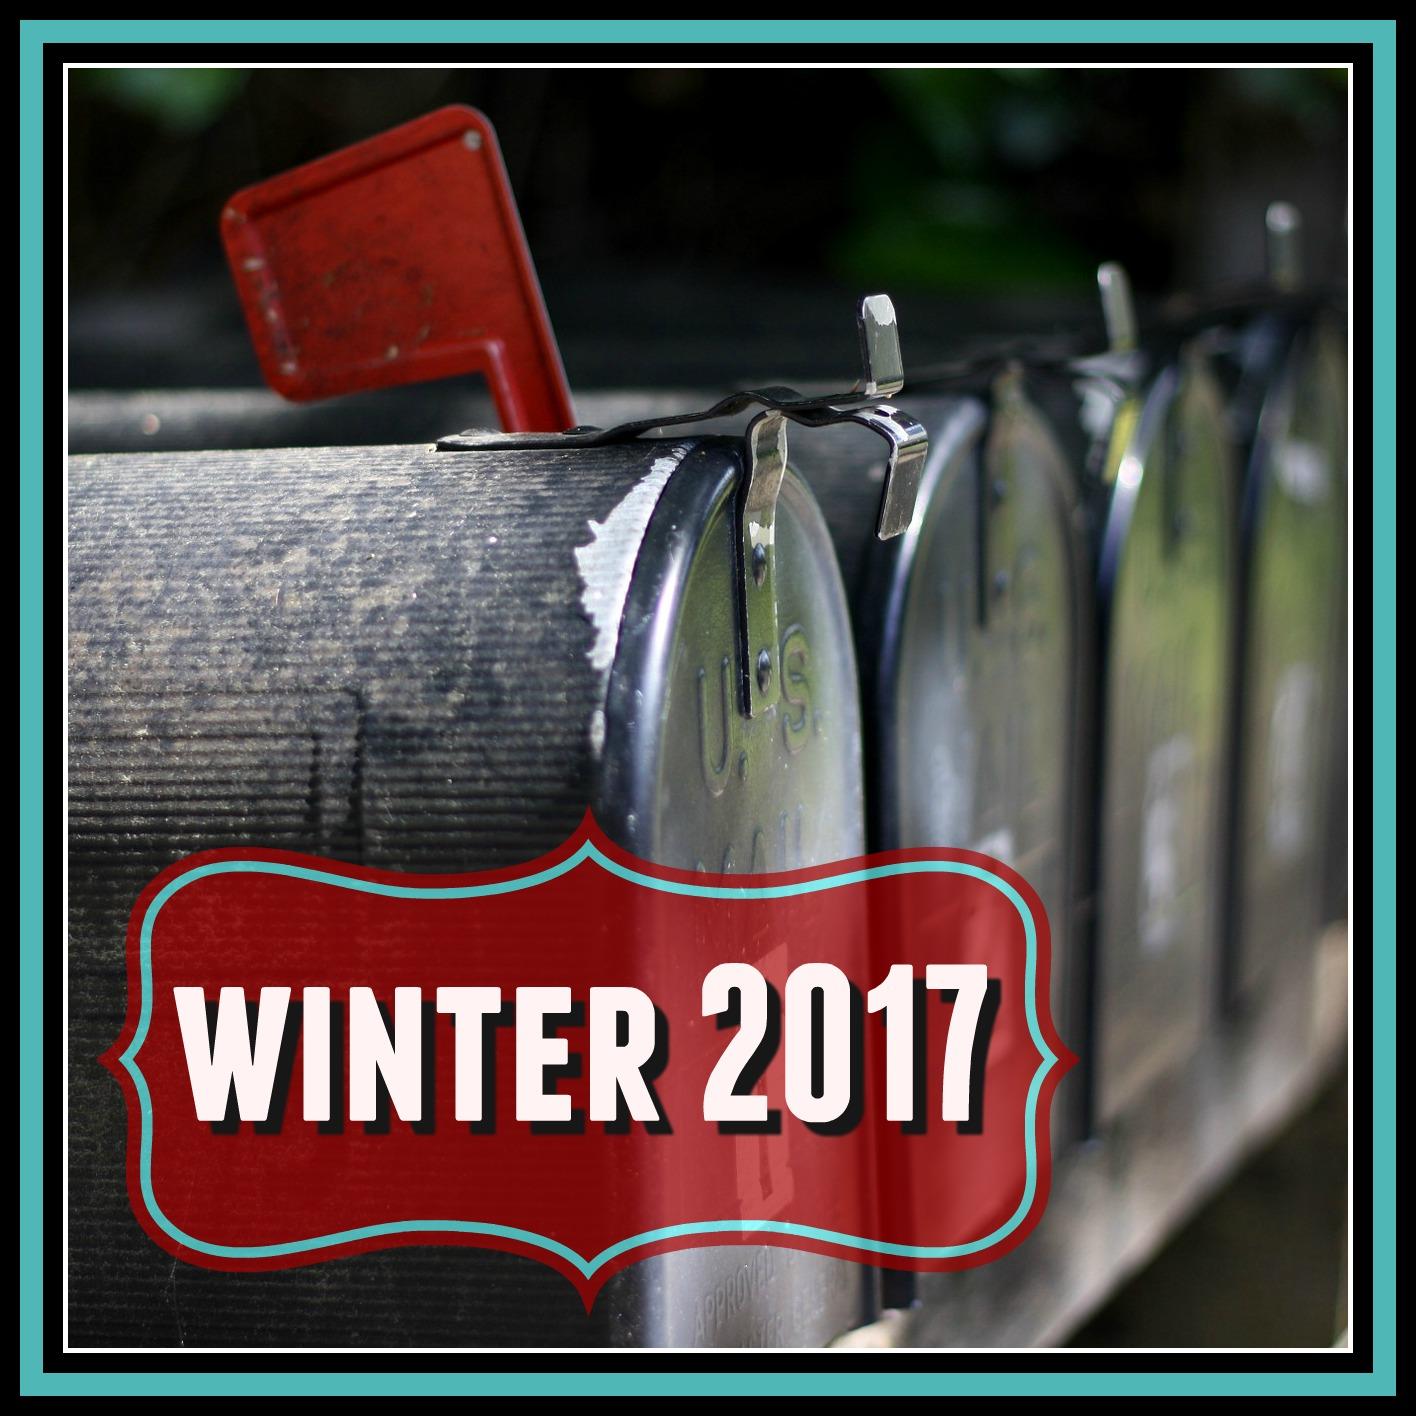 winter 2017.jpg